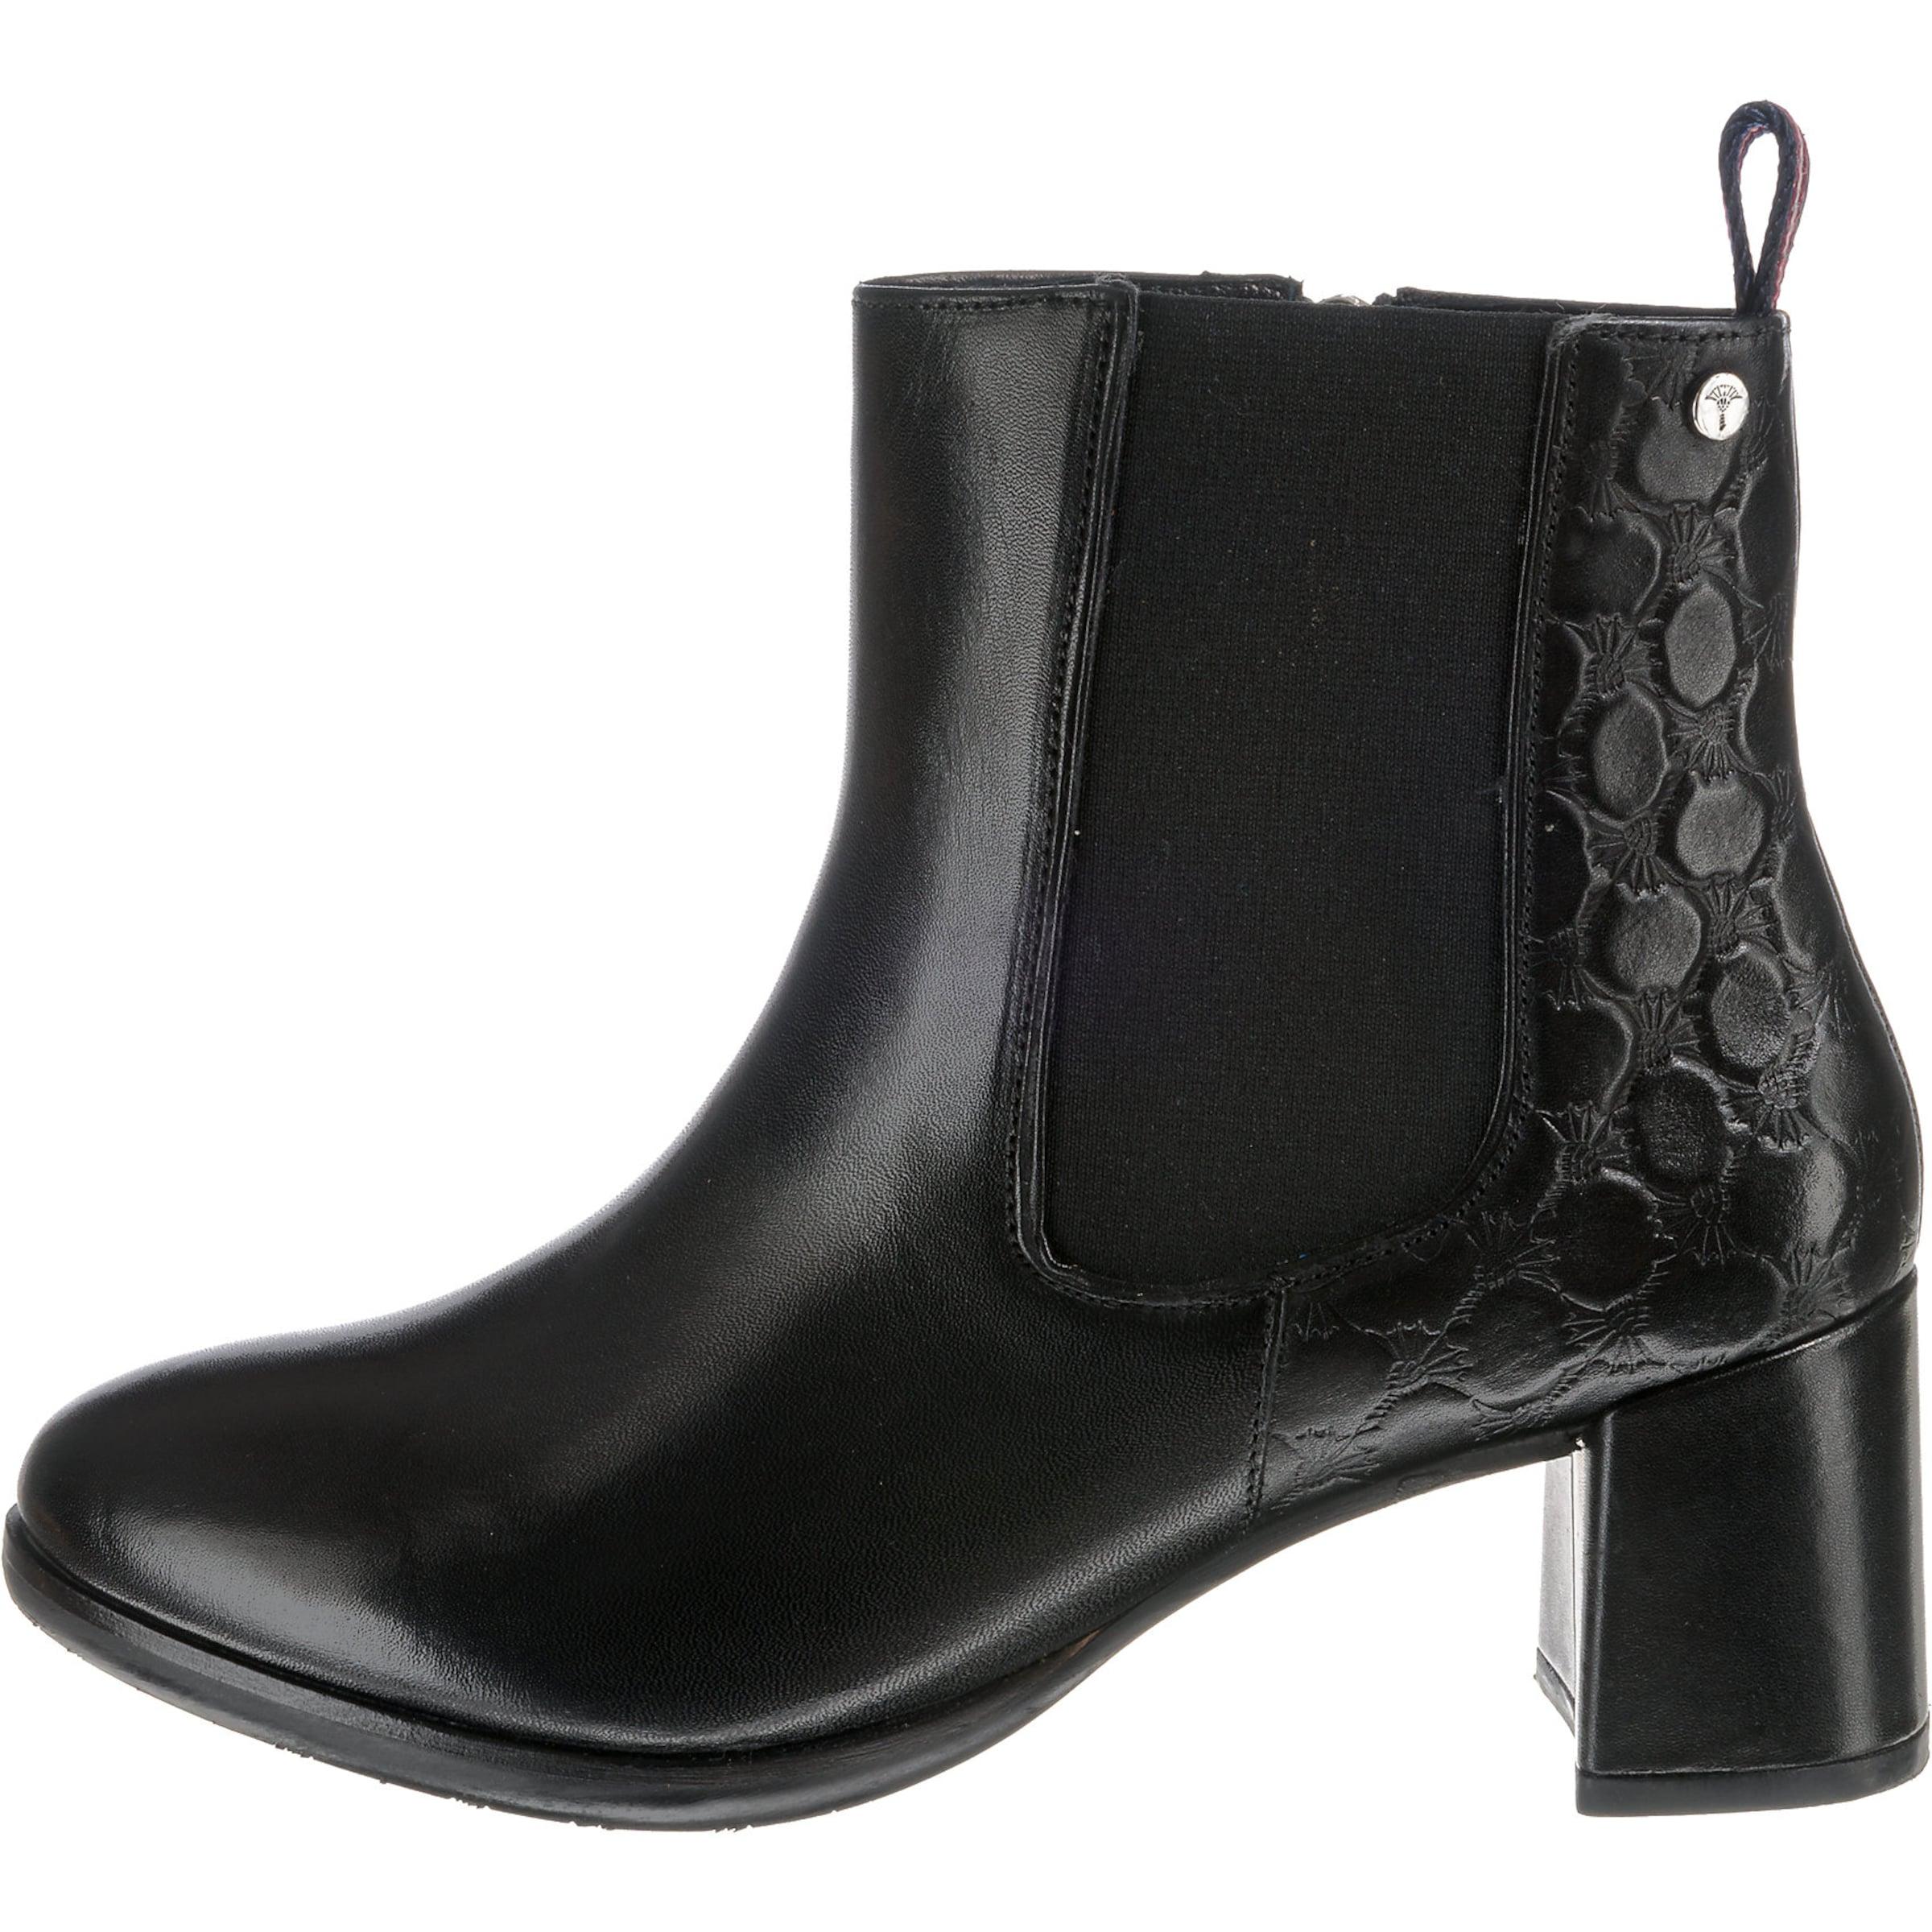 Boots Schwarz Schwarz JoopChelsea 'nara' Boots 'nara' Boots JoopChelsea JoopChelsea In 'nara' In CxdeEWQrBo